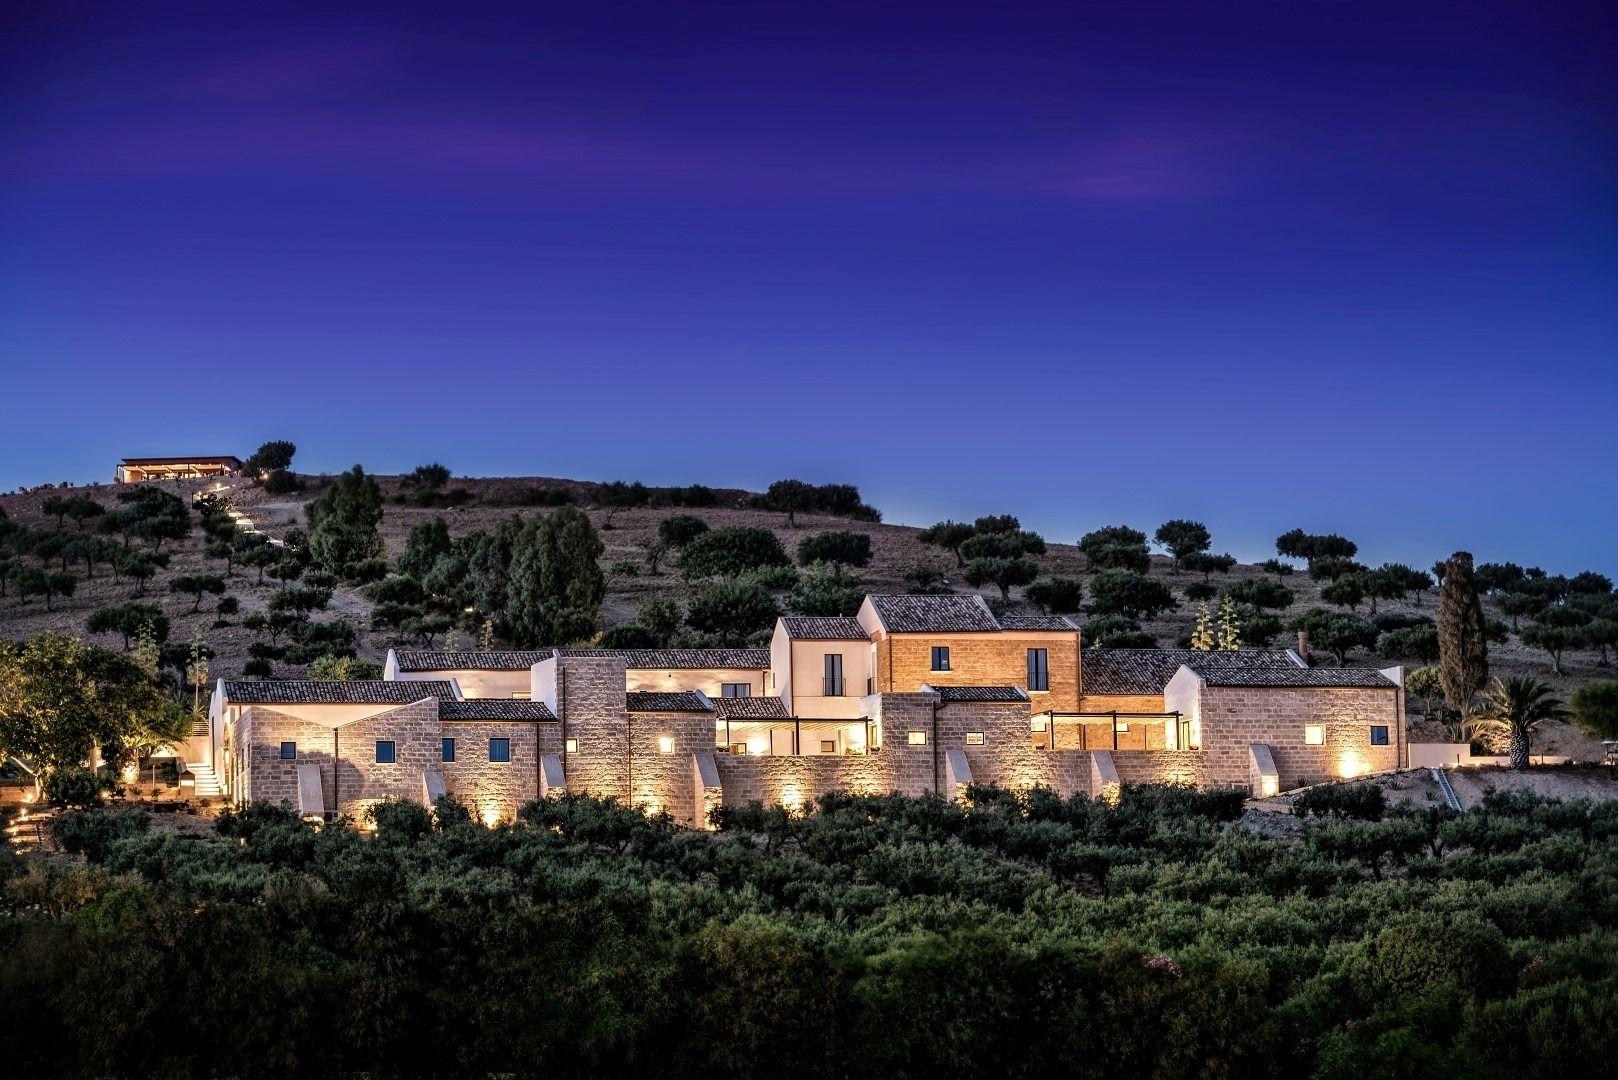 ©all copyright reserved by Firriato - 7 Resort Baglio Soria - Baglio Sorìa